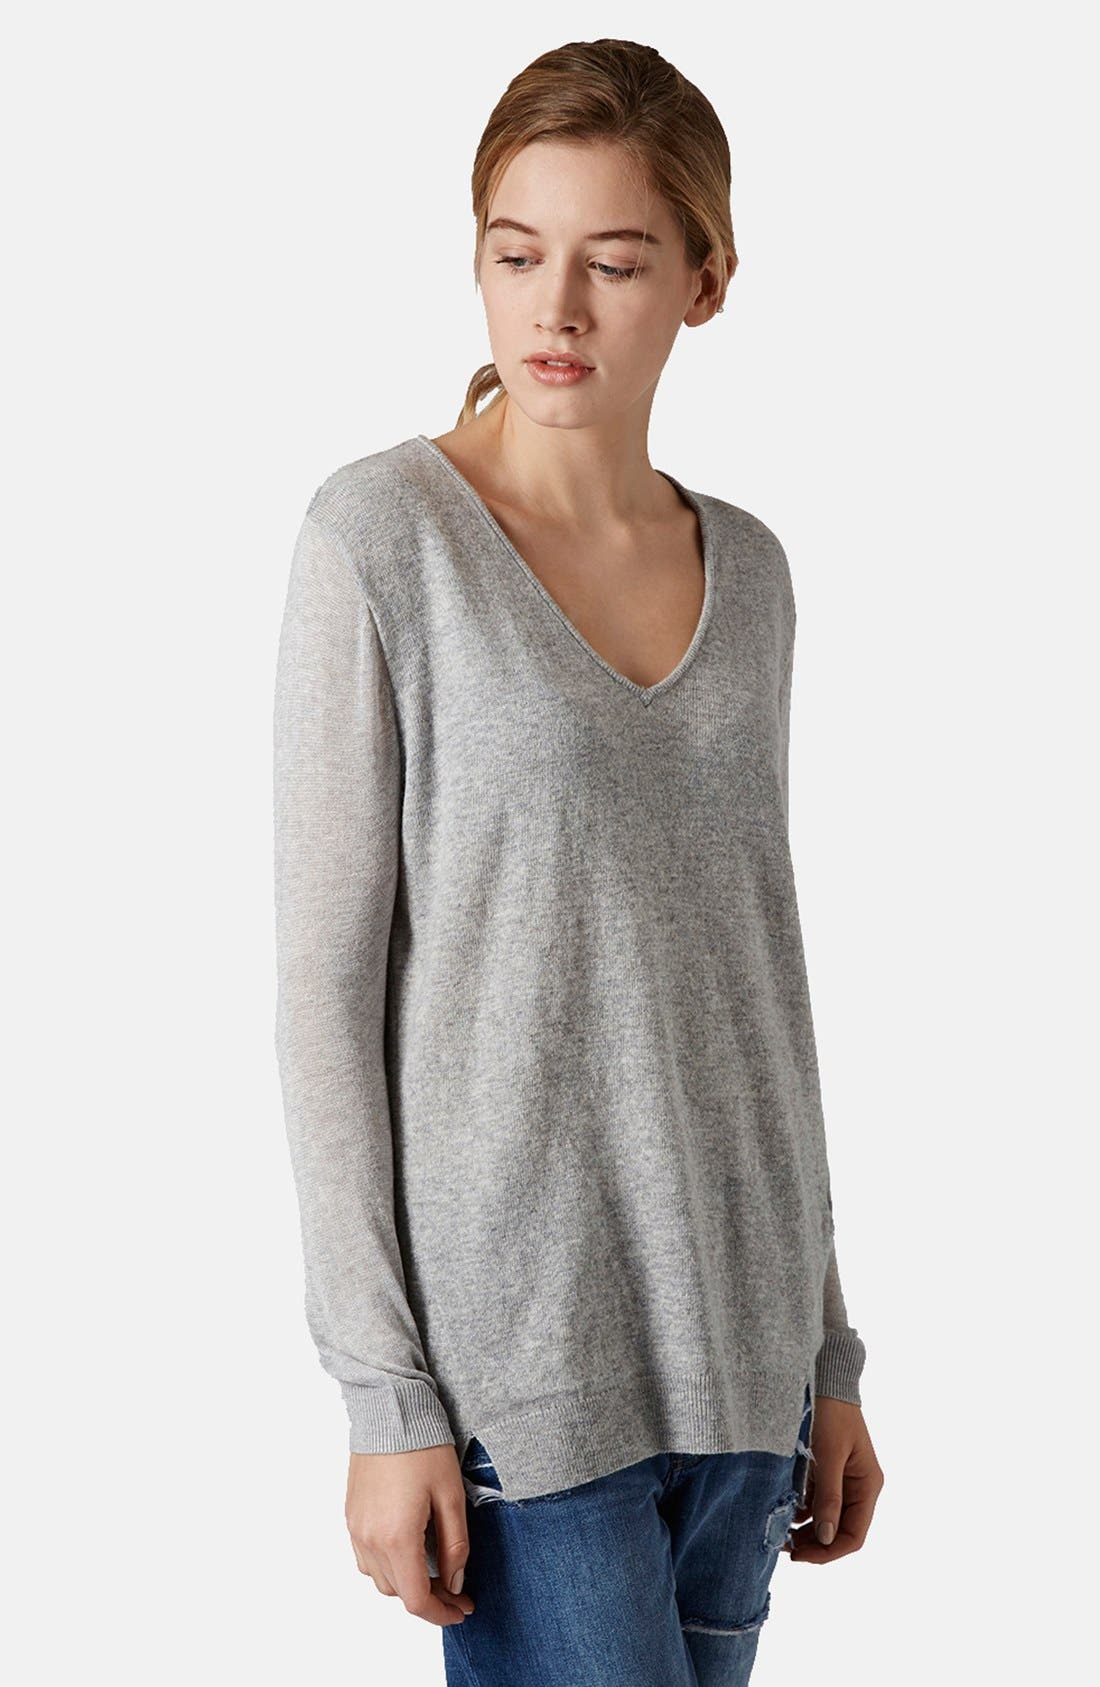 Alternate Image 1 Selected - Topshop Sheer Sleeve Tunic Sweater